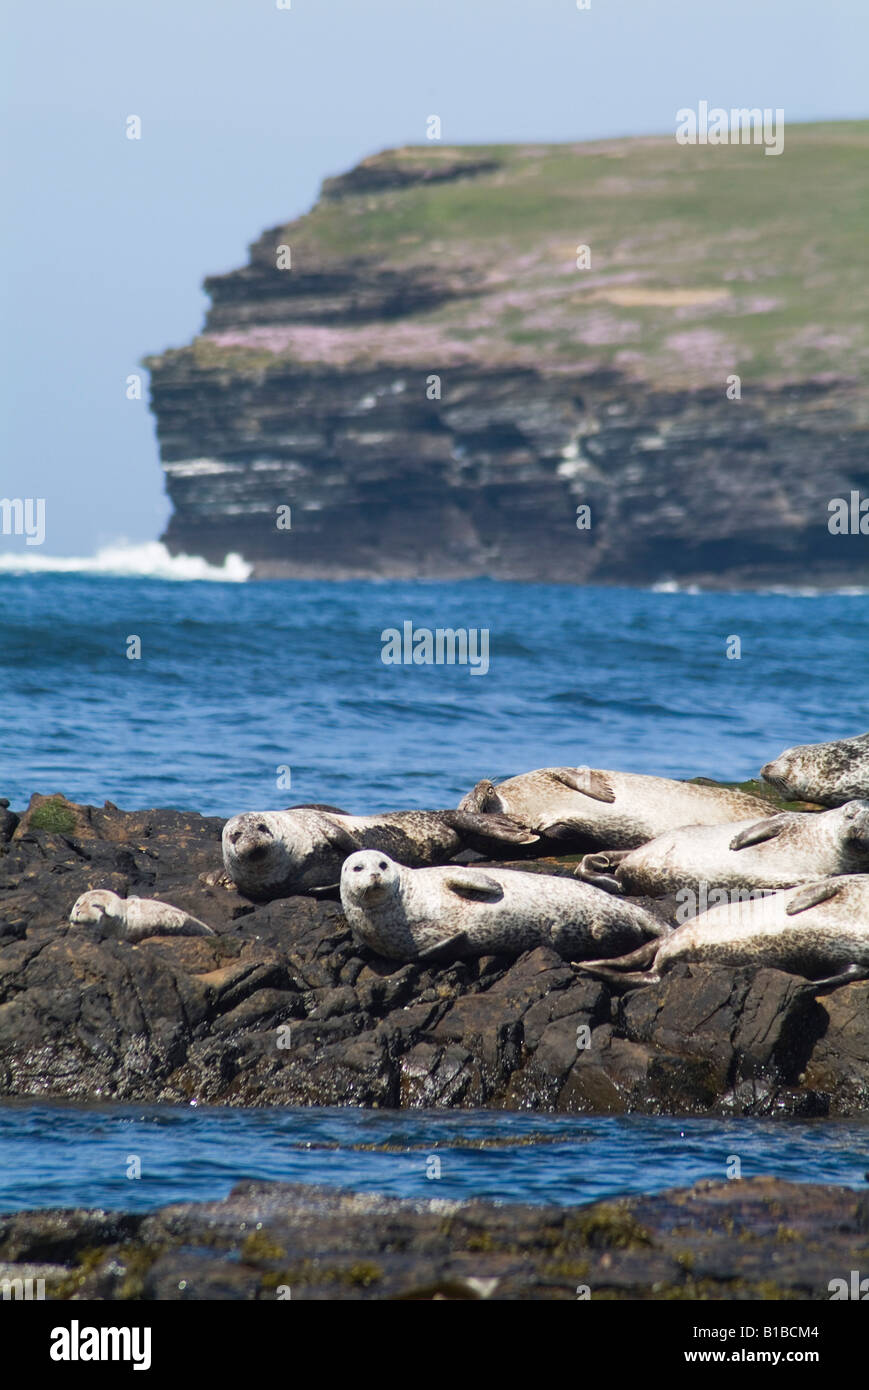 dh Phoca vitulina SEAL ORKNEY uk Common seal basking on rock Birsay Orkney rocks seals colony Scotland Stock Photo